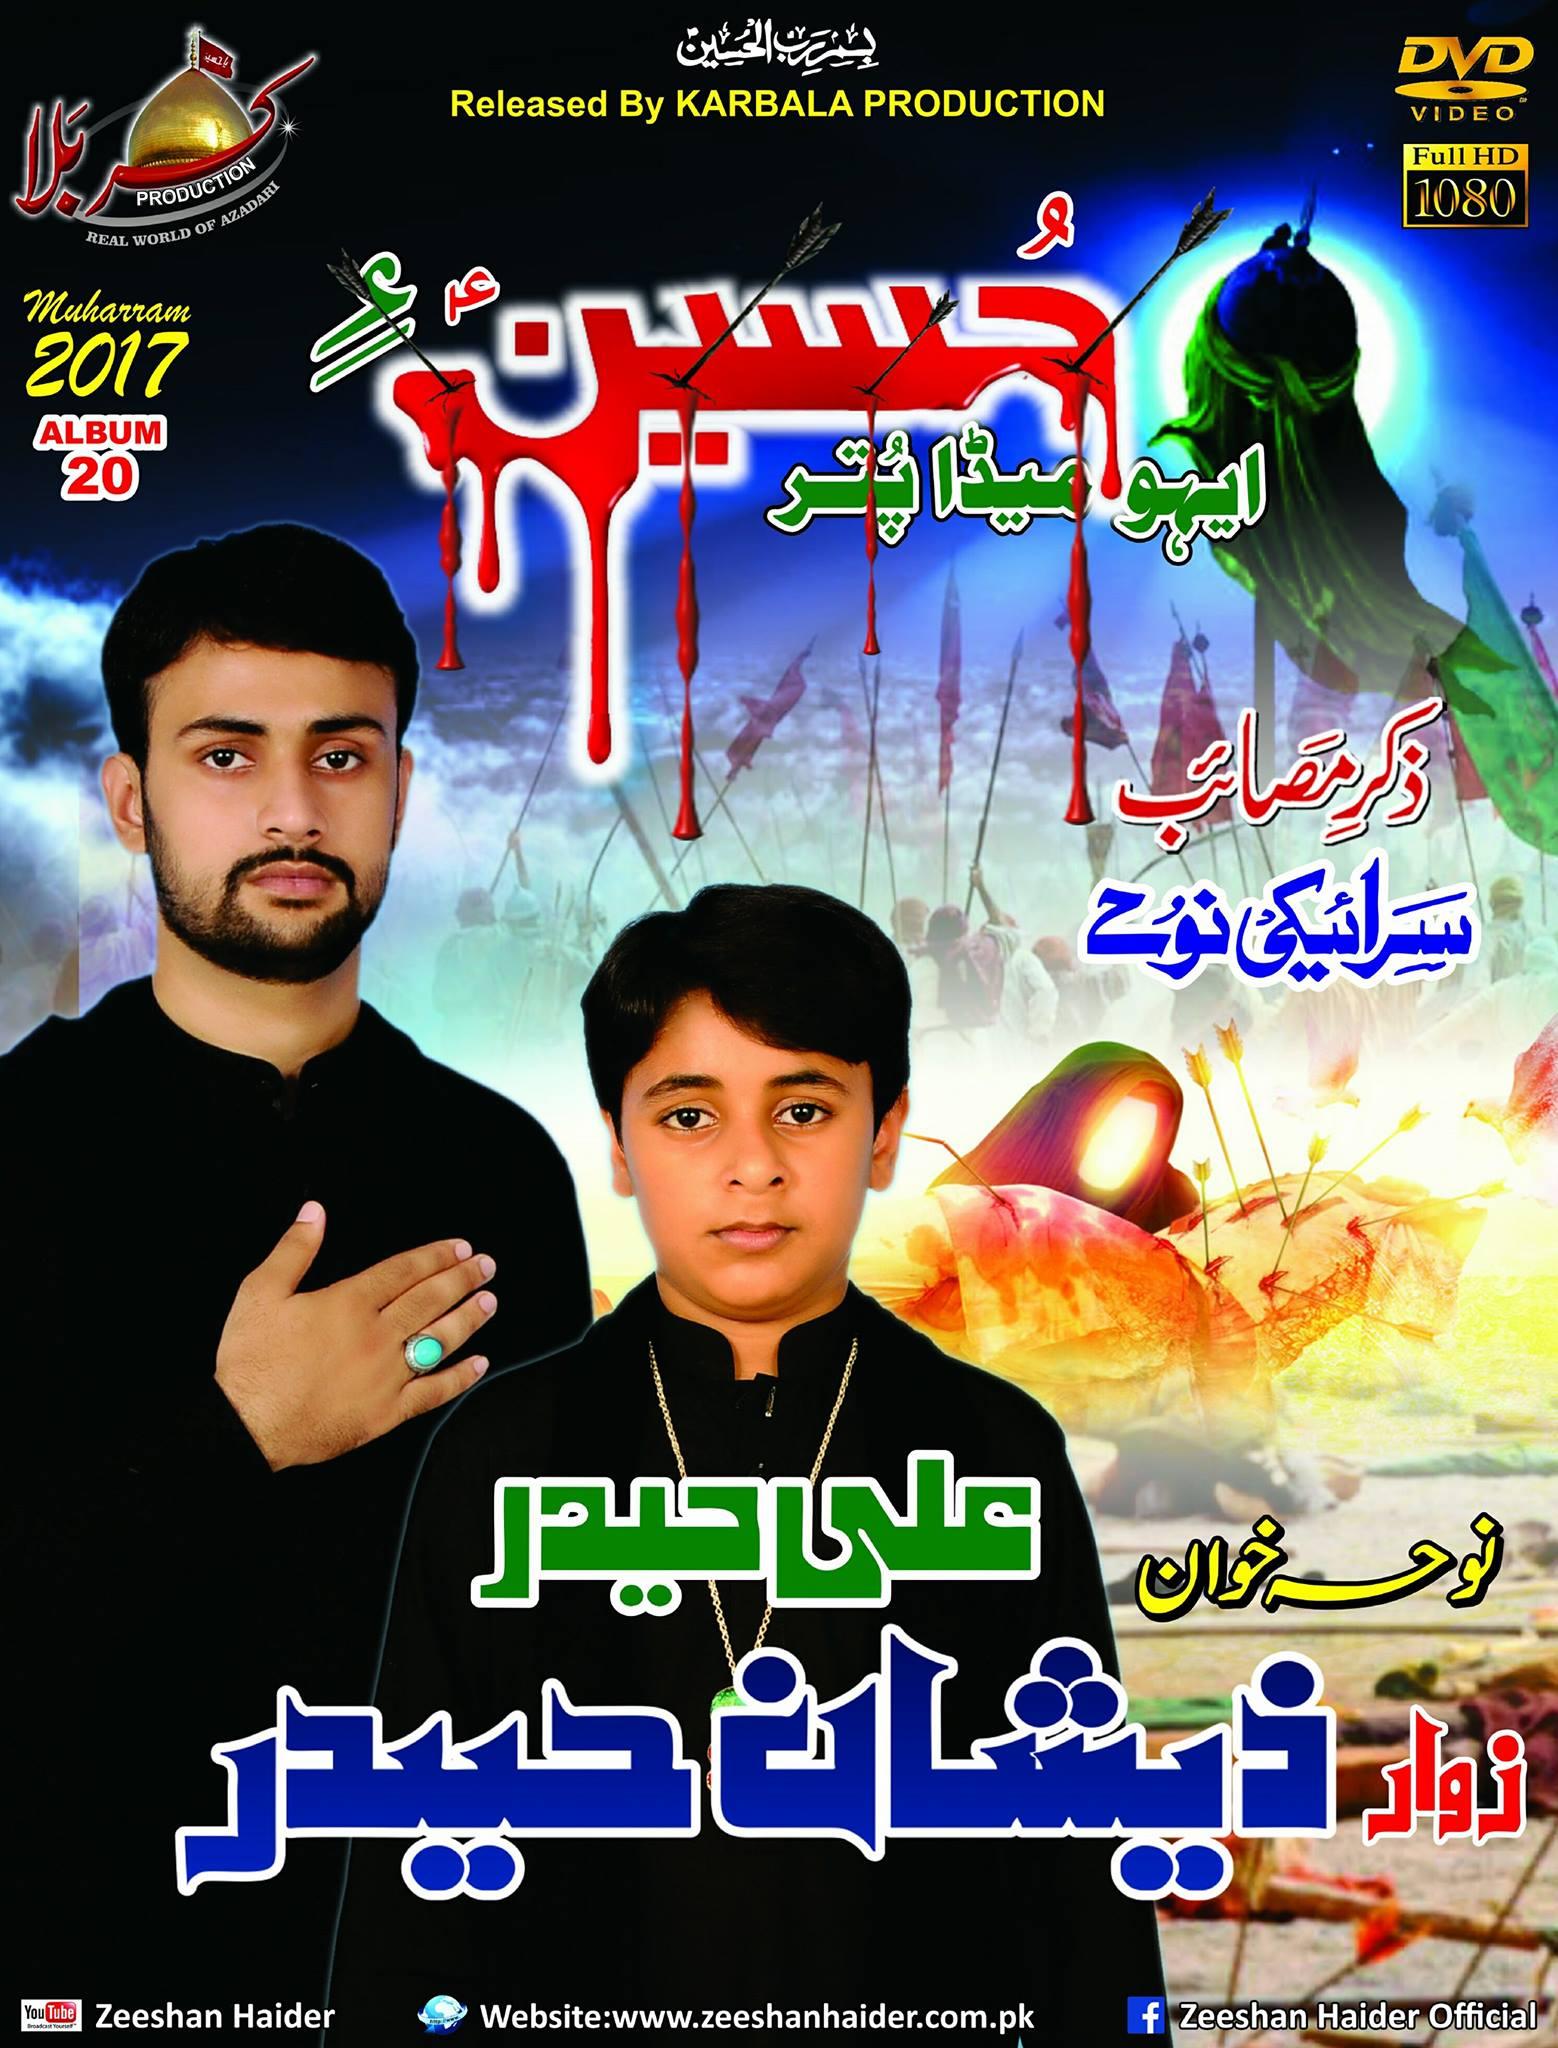 BAZAR SAJ GAY Ali Haider